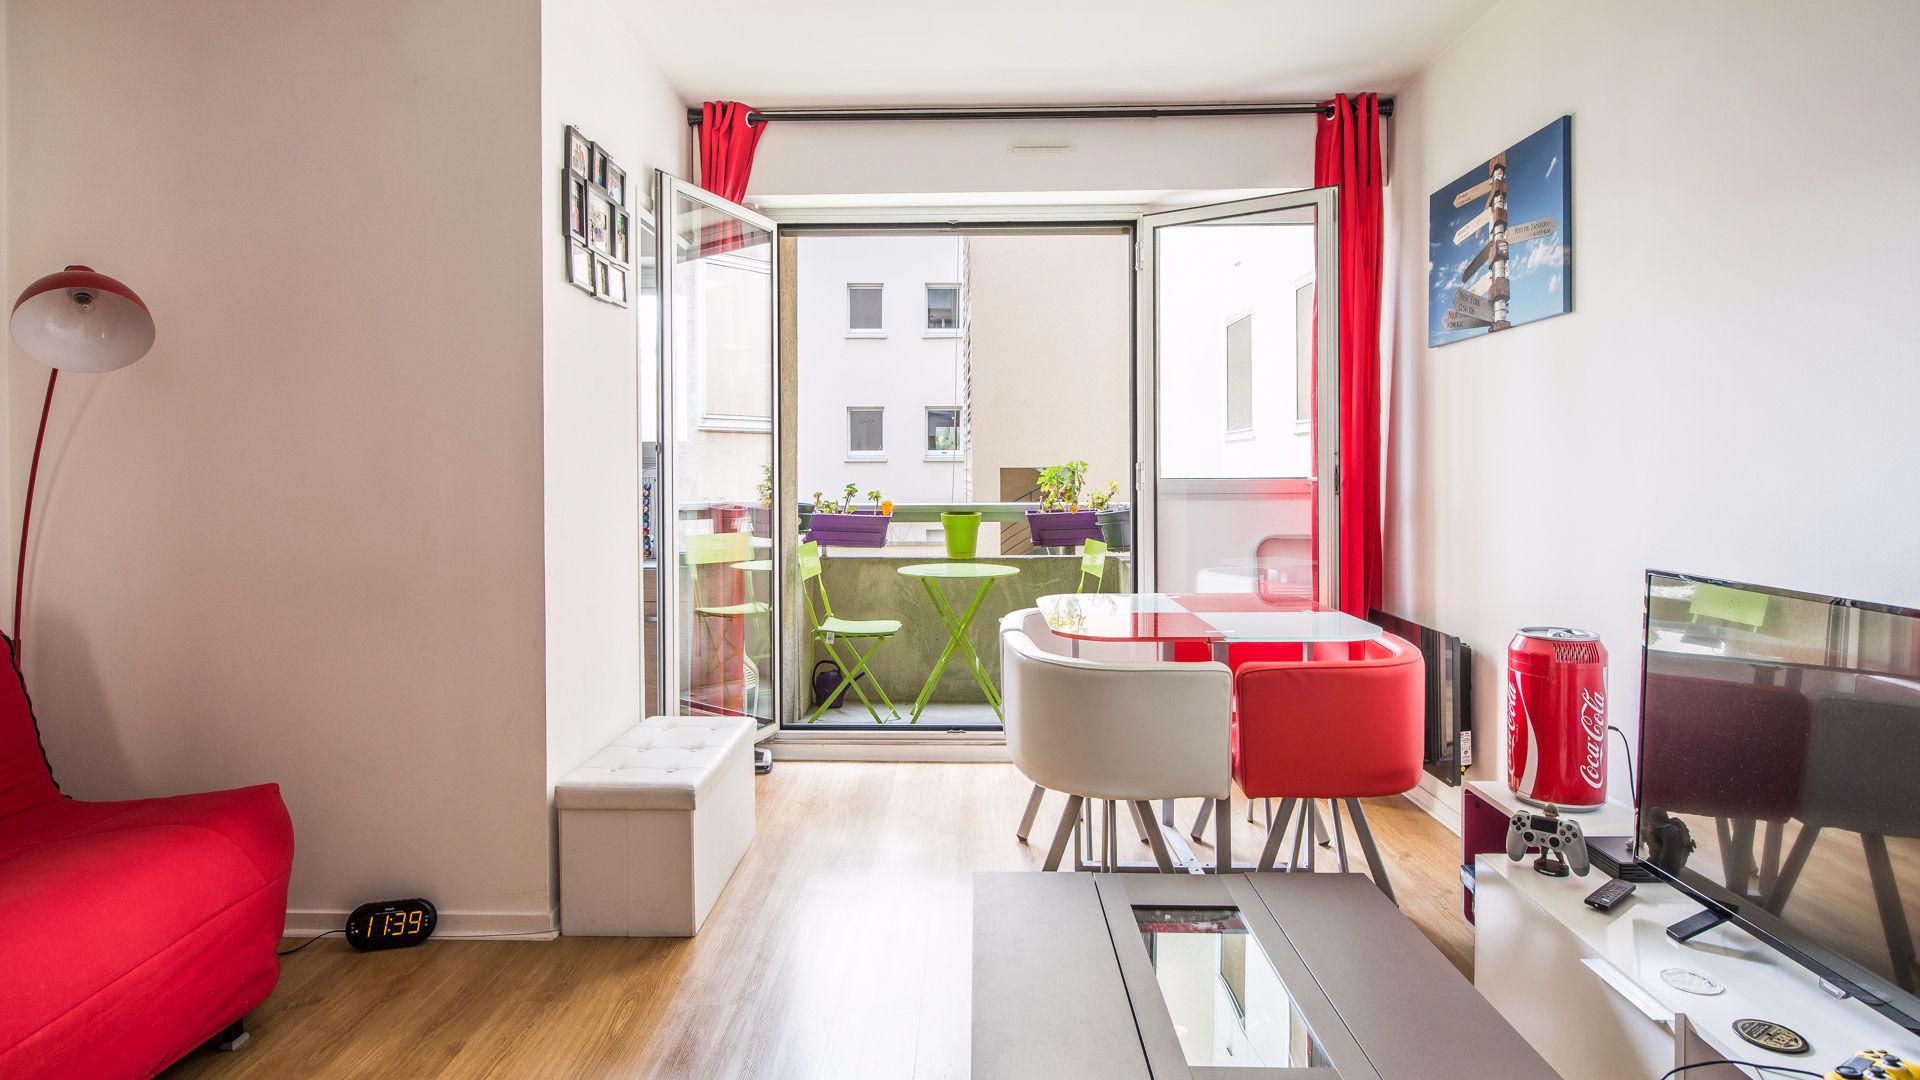 courbevoie junot. Black Bedroom Furniture Sets. Home Design Ideas